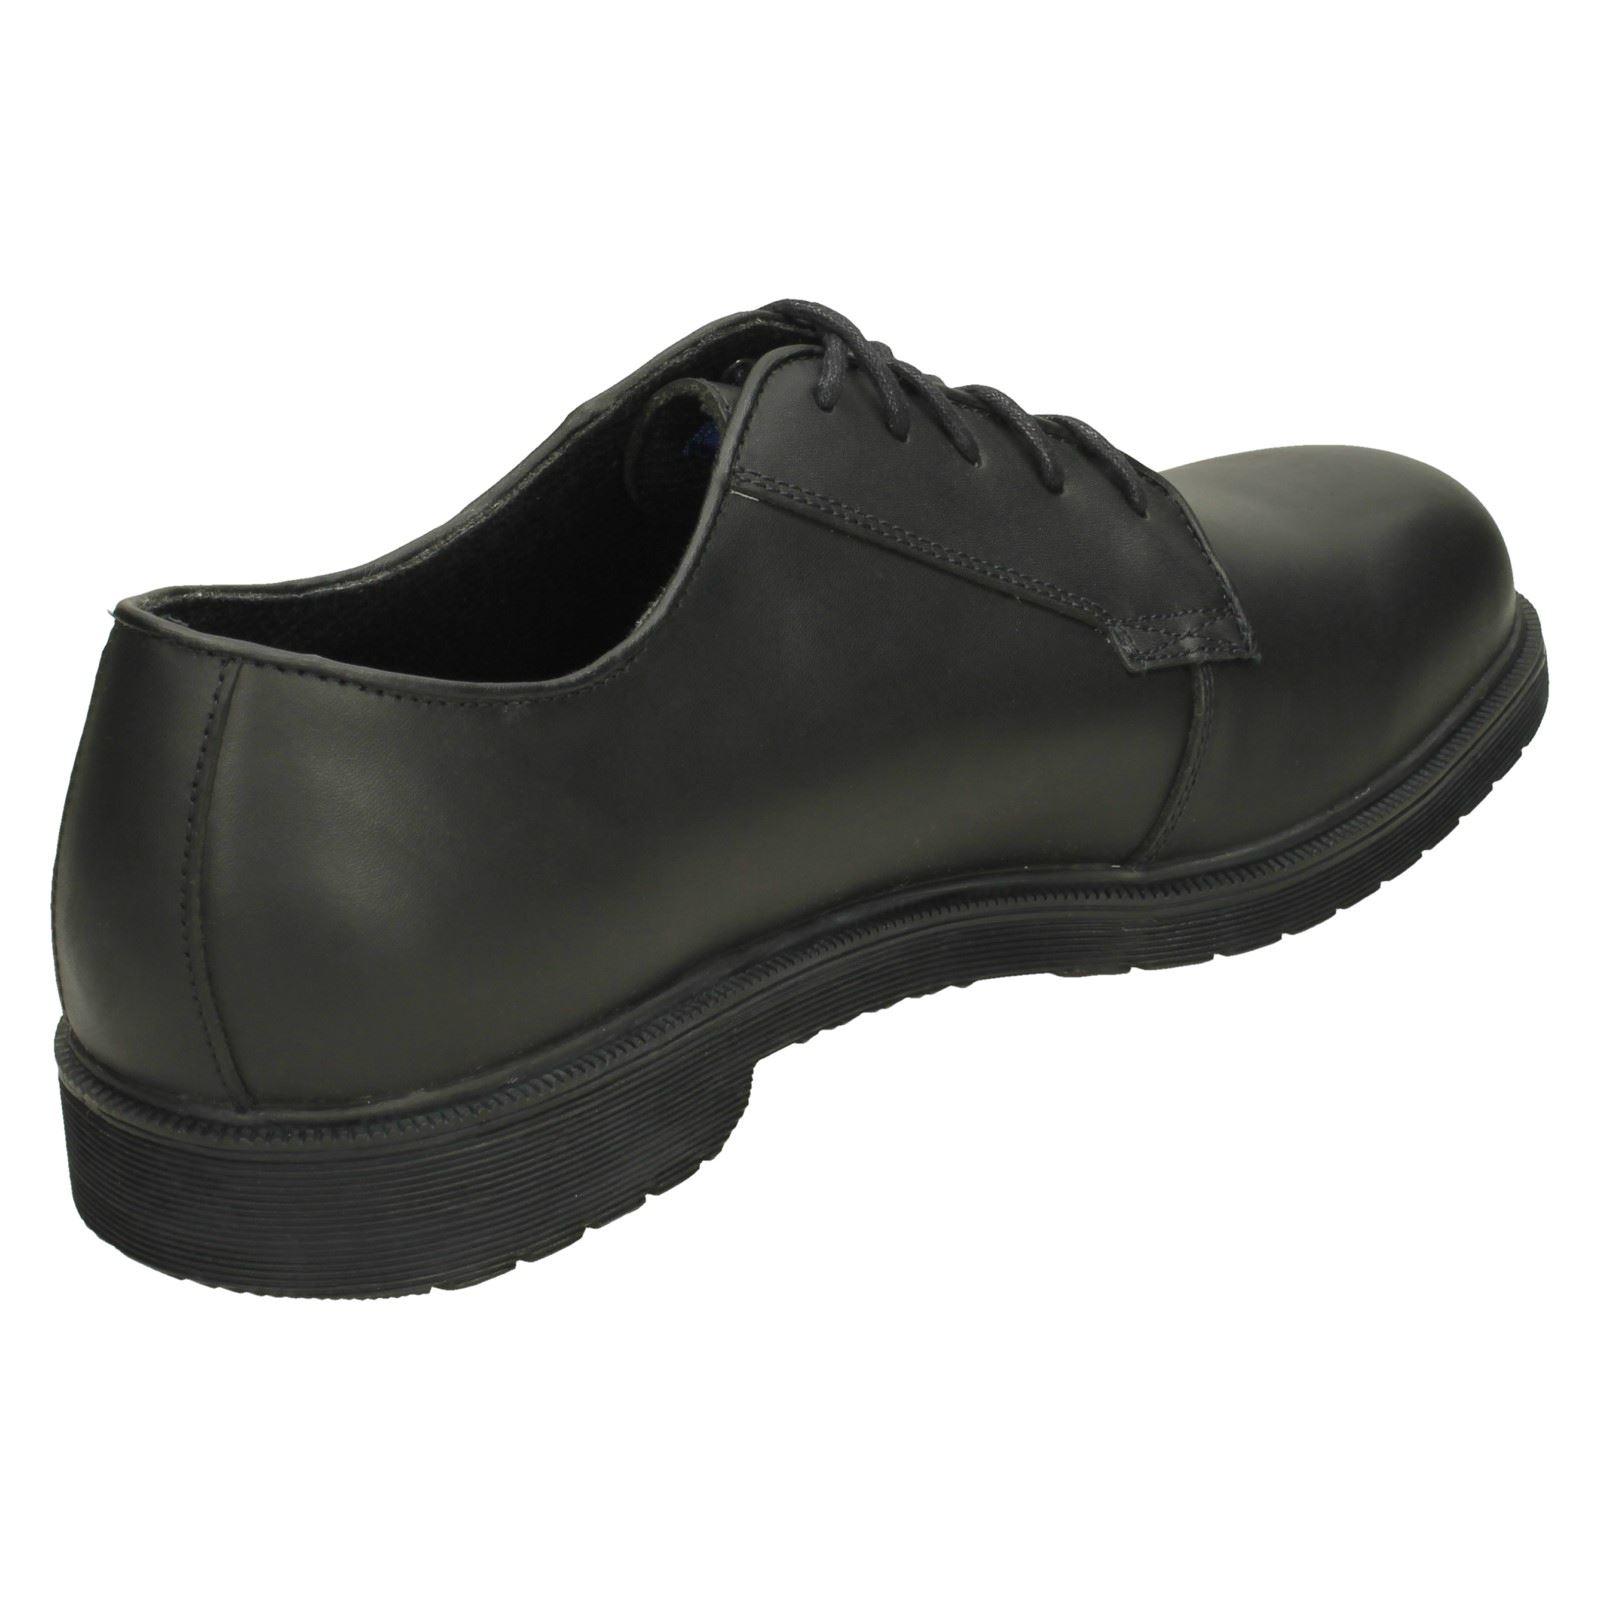 Duty Shoes Black Safety Mens Magnum 4wRfqxOq